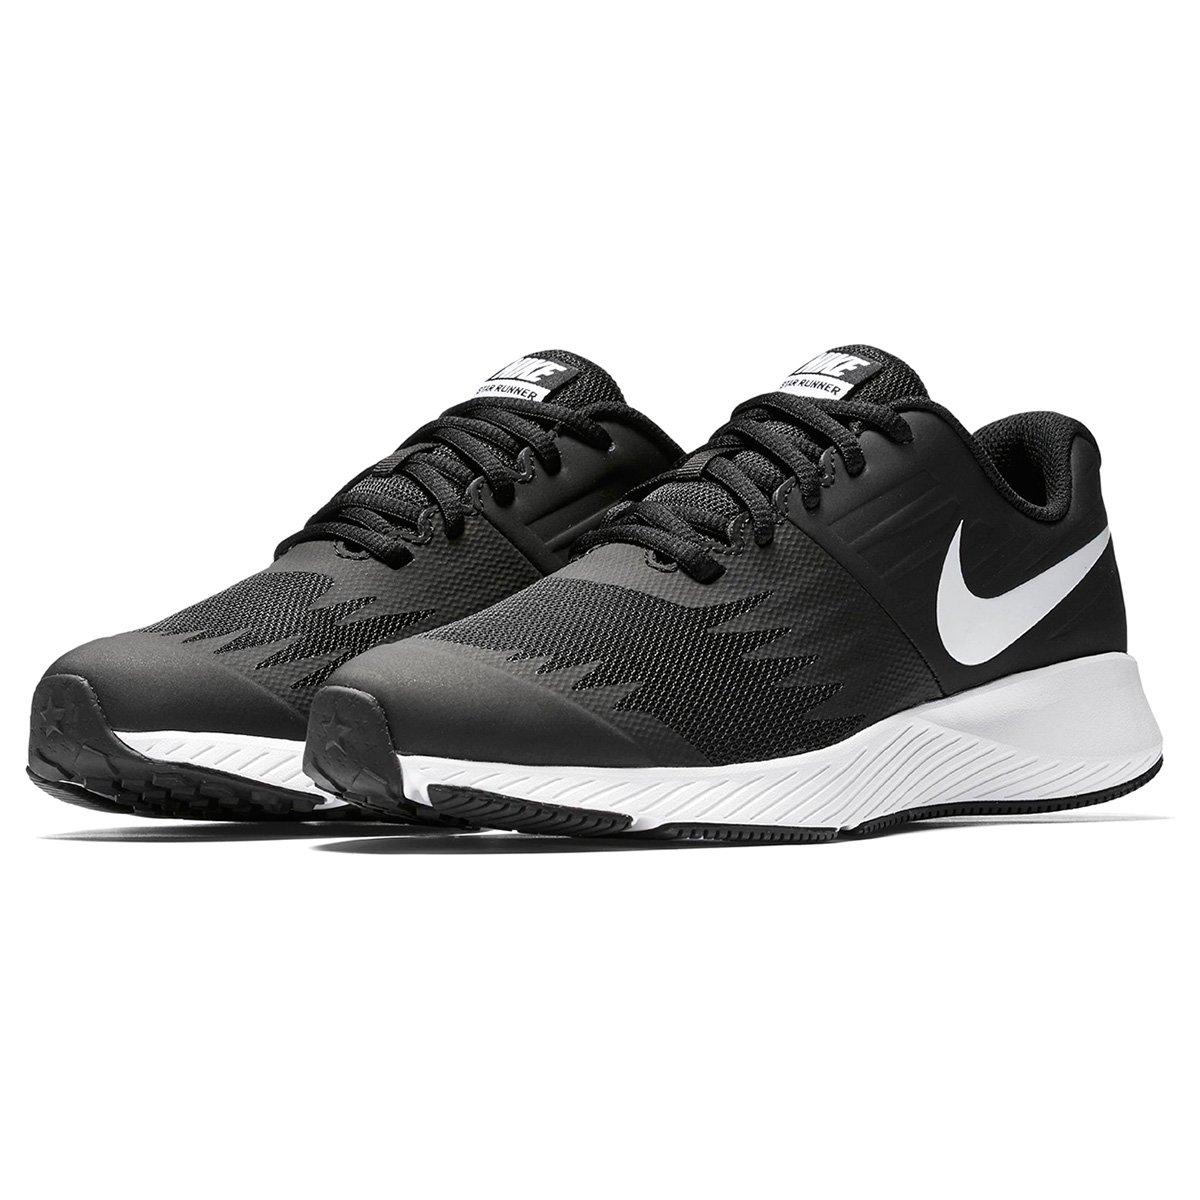 7bc9dae6aa Tênis Infantil Nike Star Runner GS - Preto e Branco - Compre Agora ...